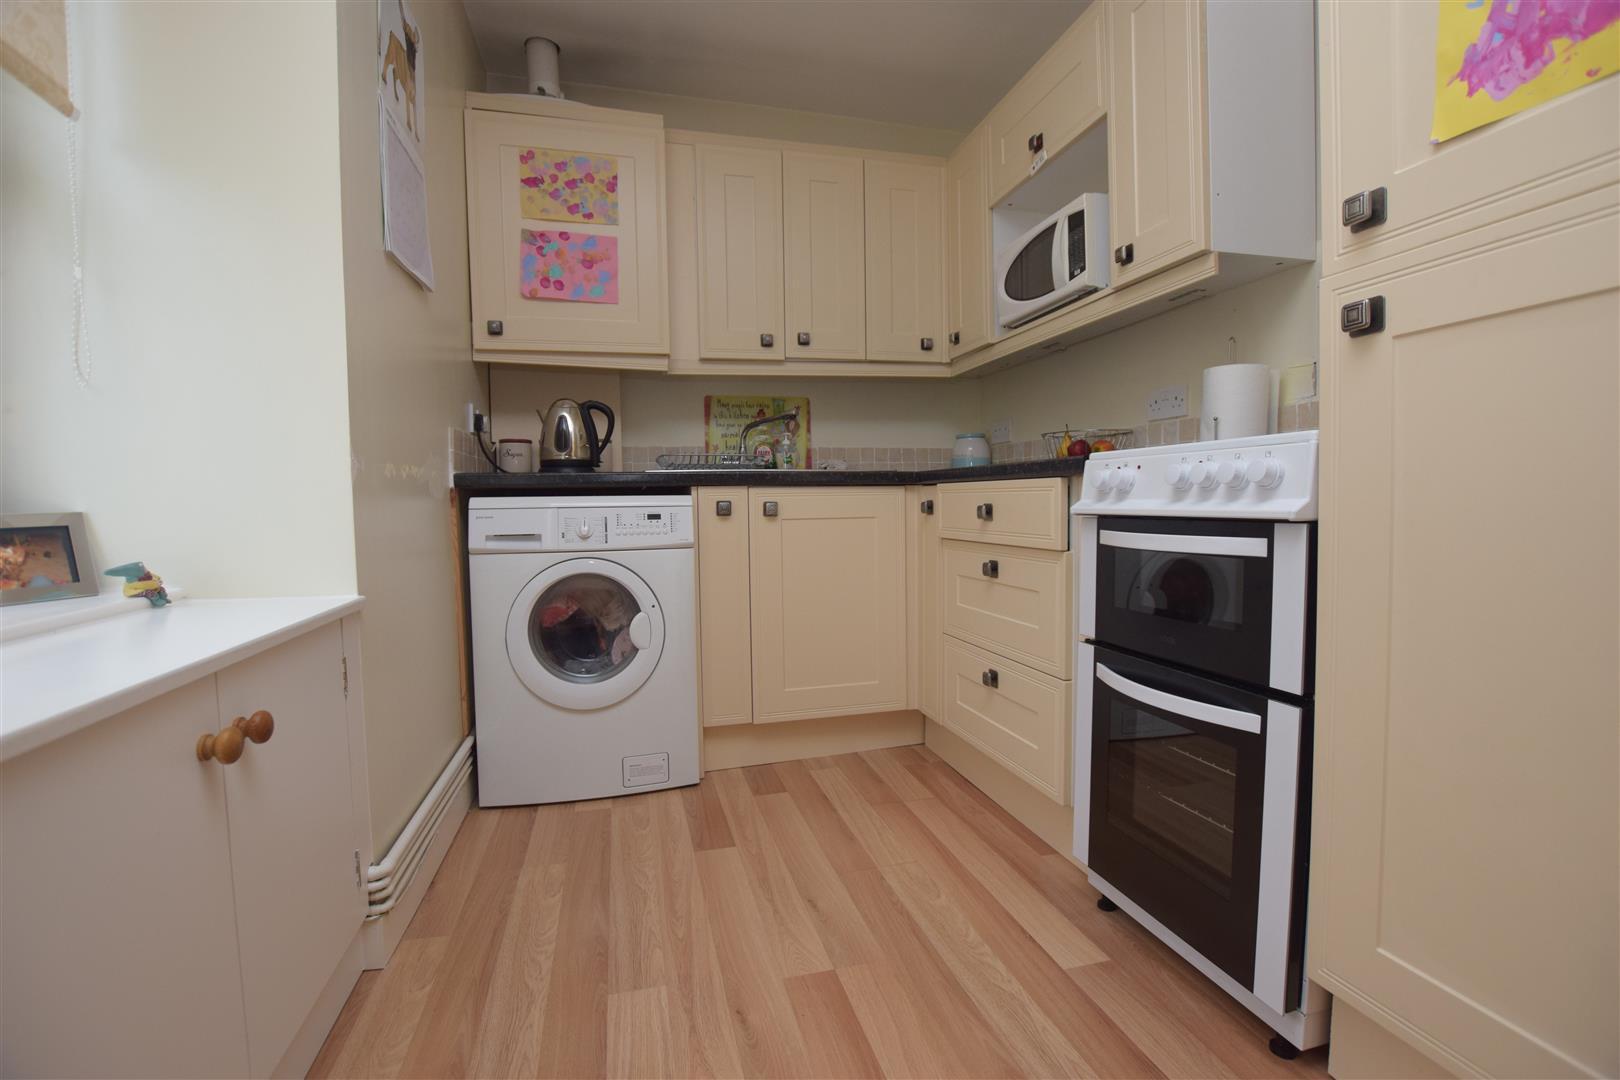 5B, Hill Street, Coupar Angus, Blairgowrie, Perthshire, PH13 9BG, UK